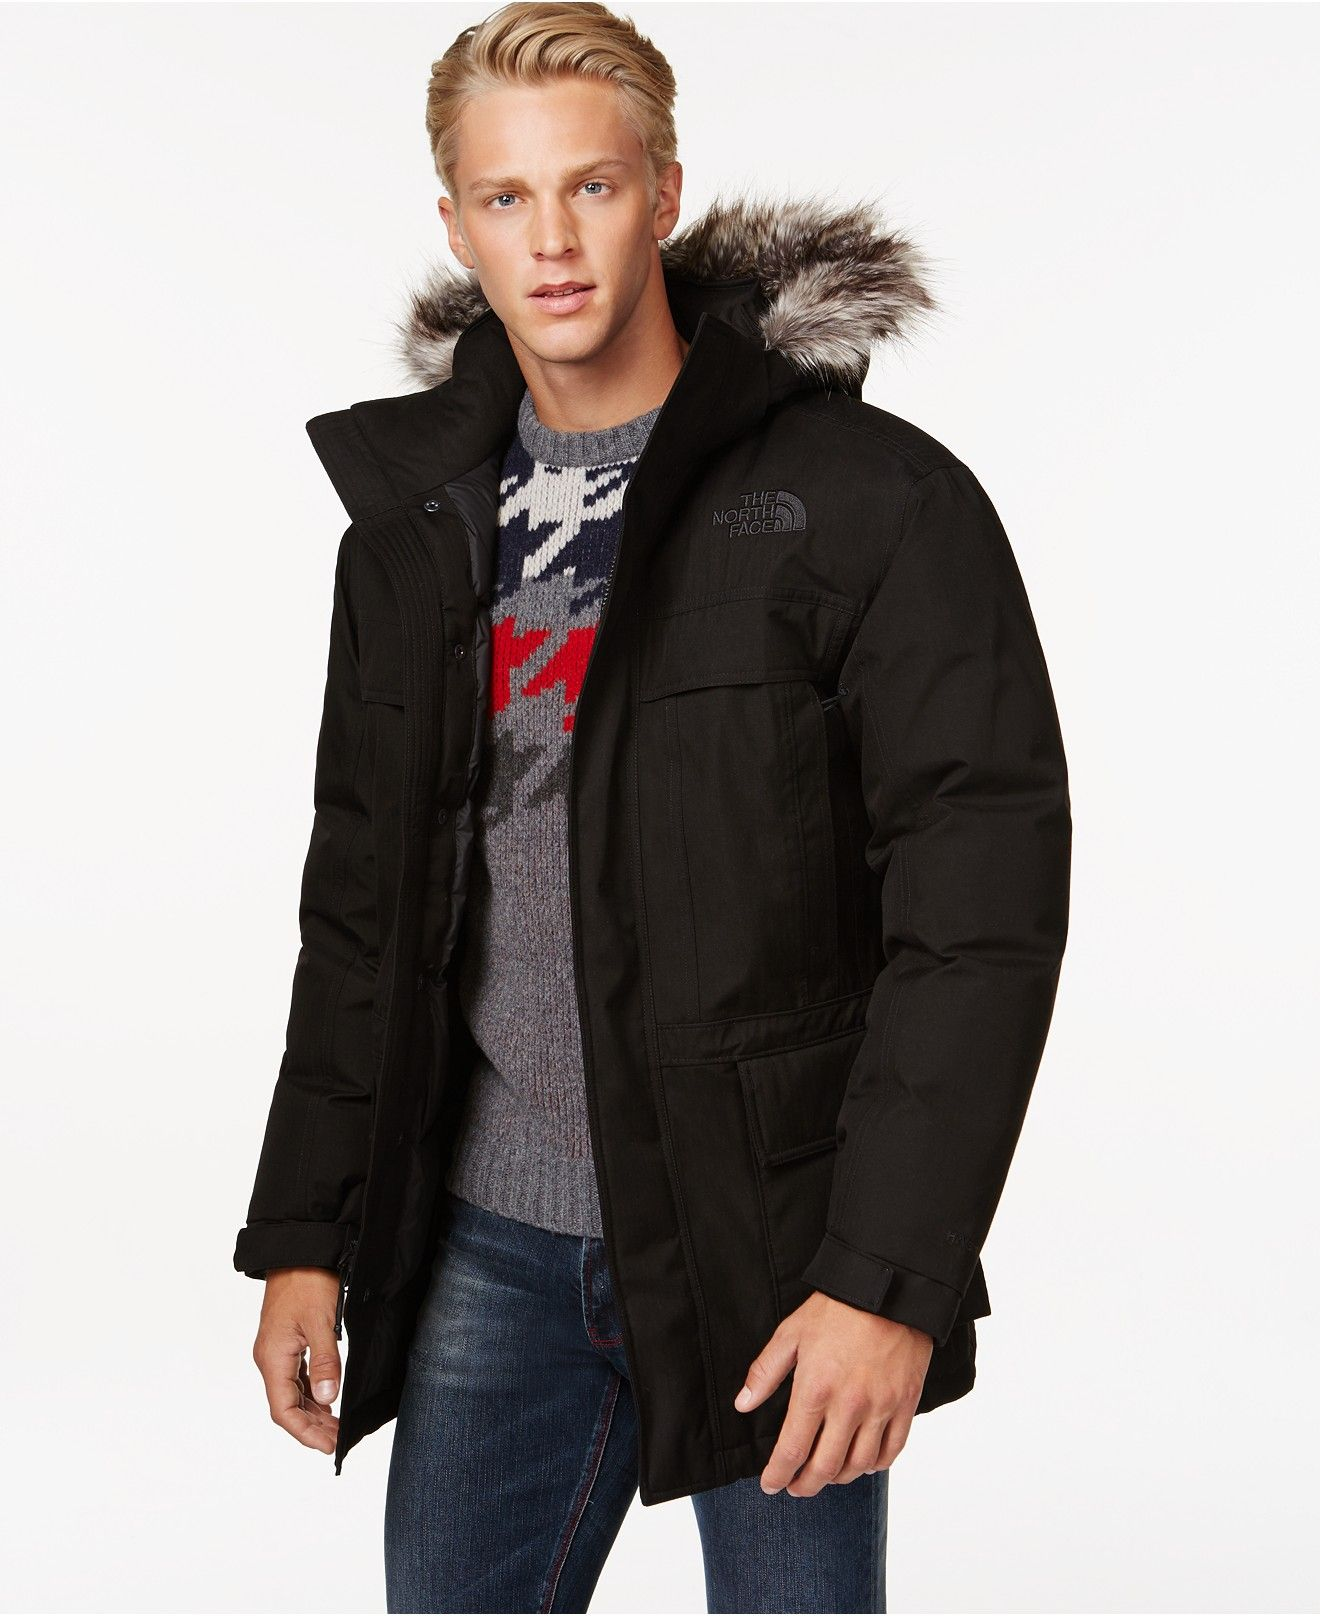 The North Face Mcmurdo Parka Ii Coats Jackets Men Macy S Mens Workout Clothes Mens Jackets North Face Parka [ 1616 x 1320 Pixel ]